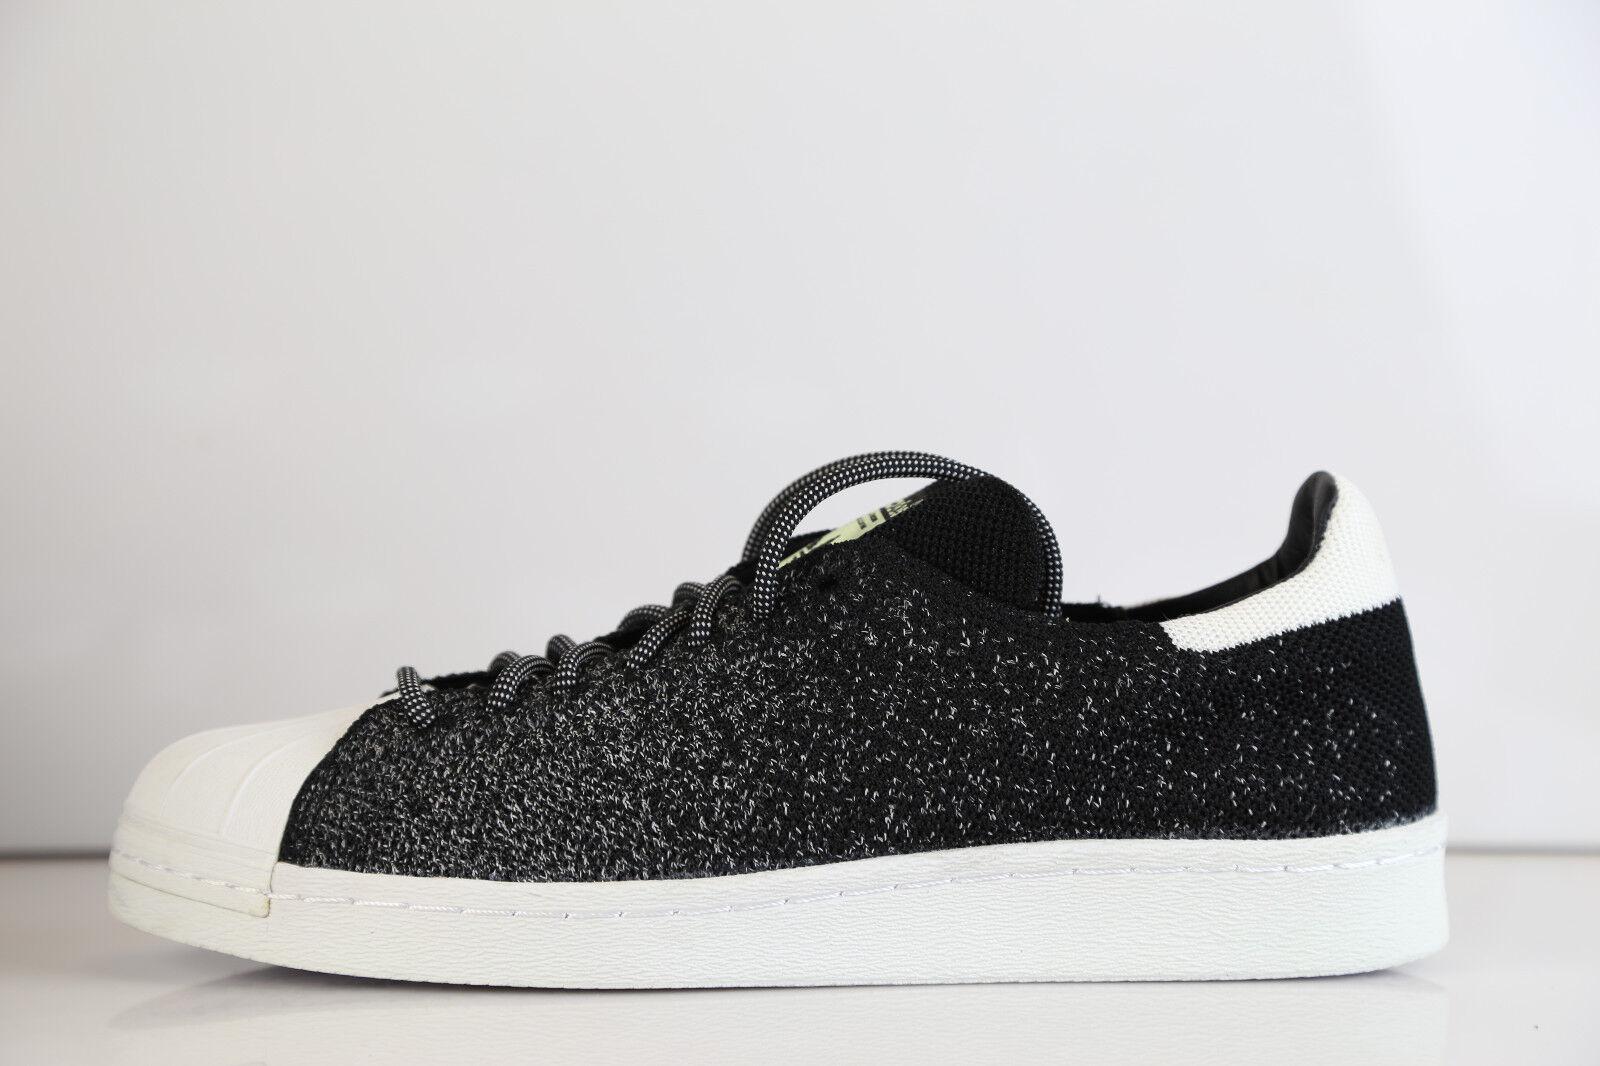 Adidas Superstar 80s PK ASG GID Glow S32029 8-11  prime knit all star black